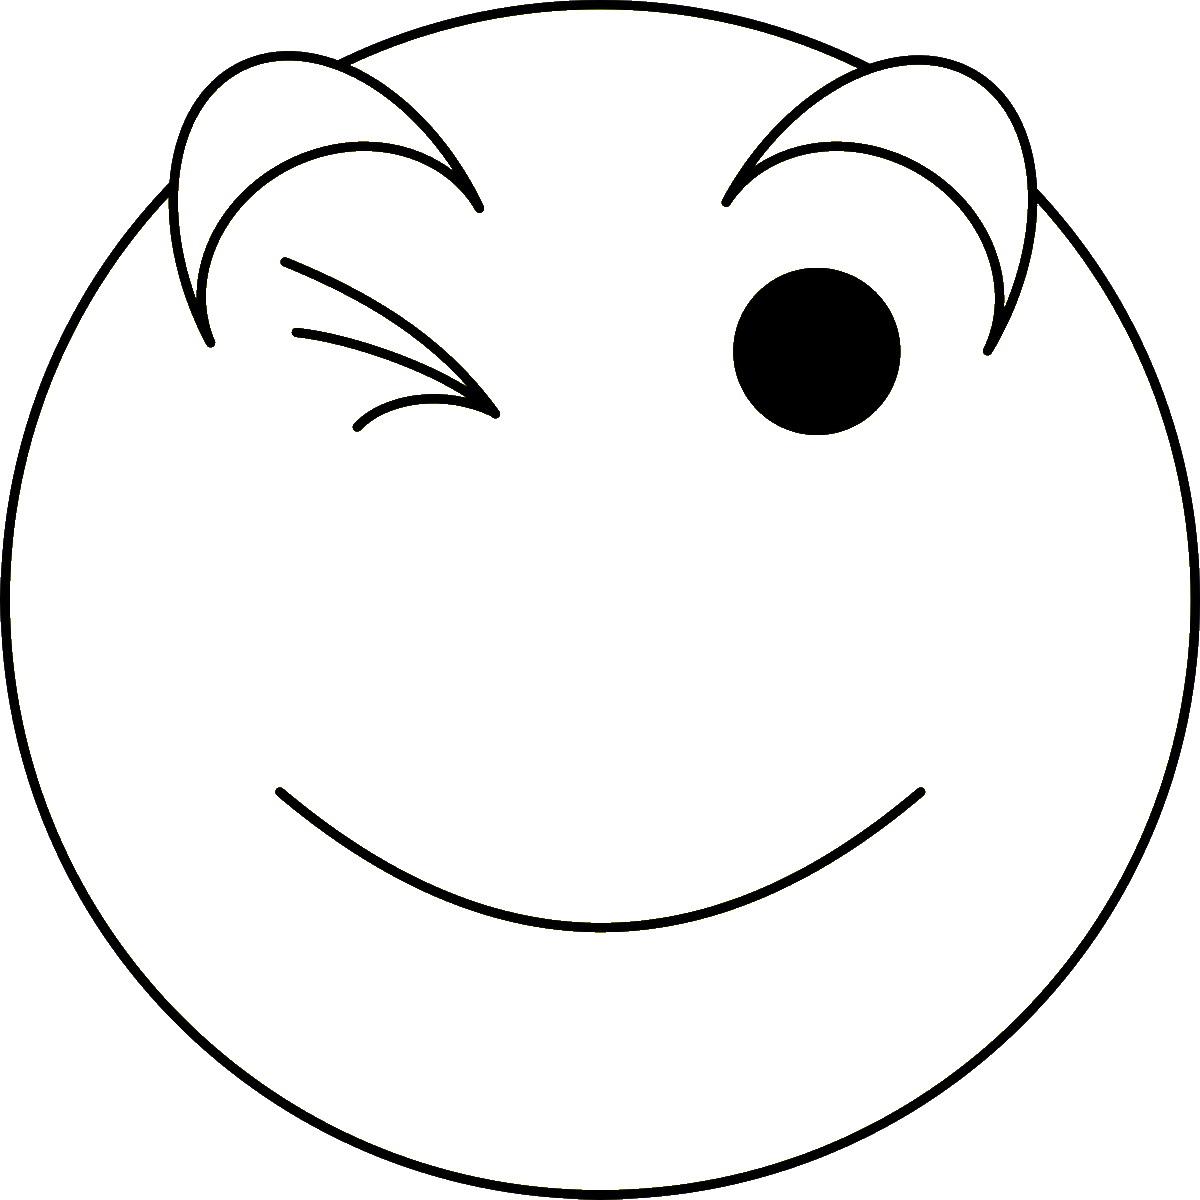 Wink Emoji Coloring Page